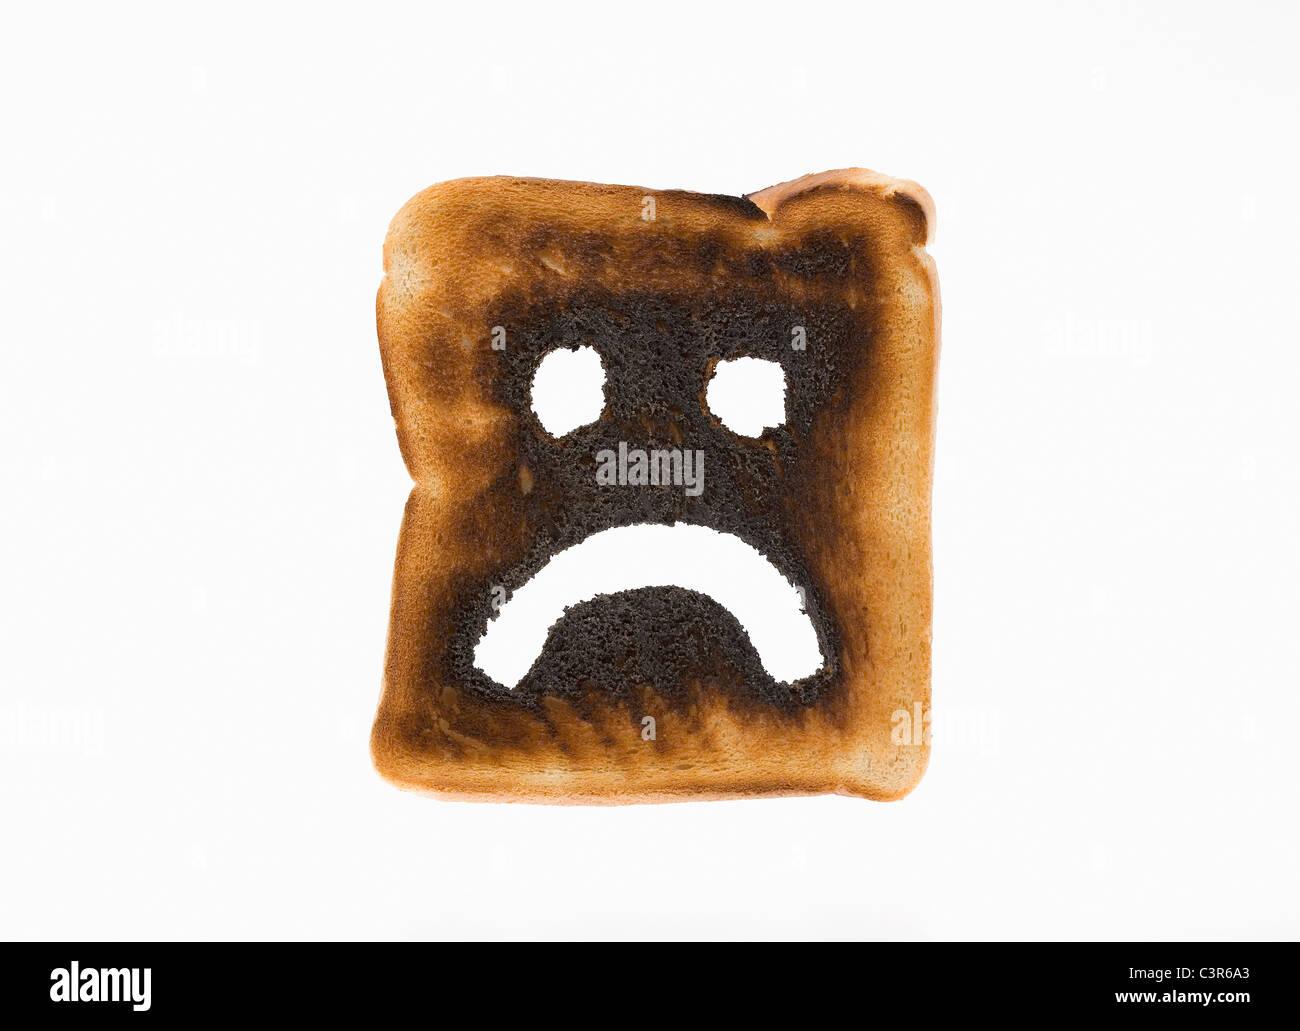 Burnt toast with sad face on it - Stock Image